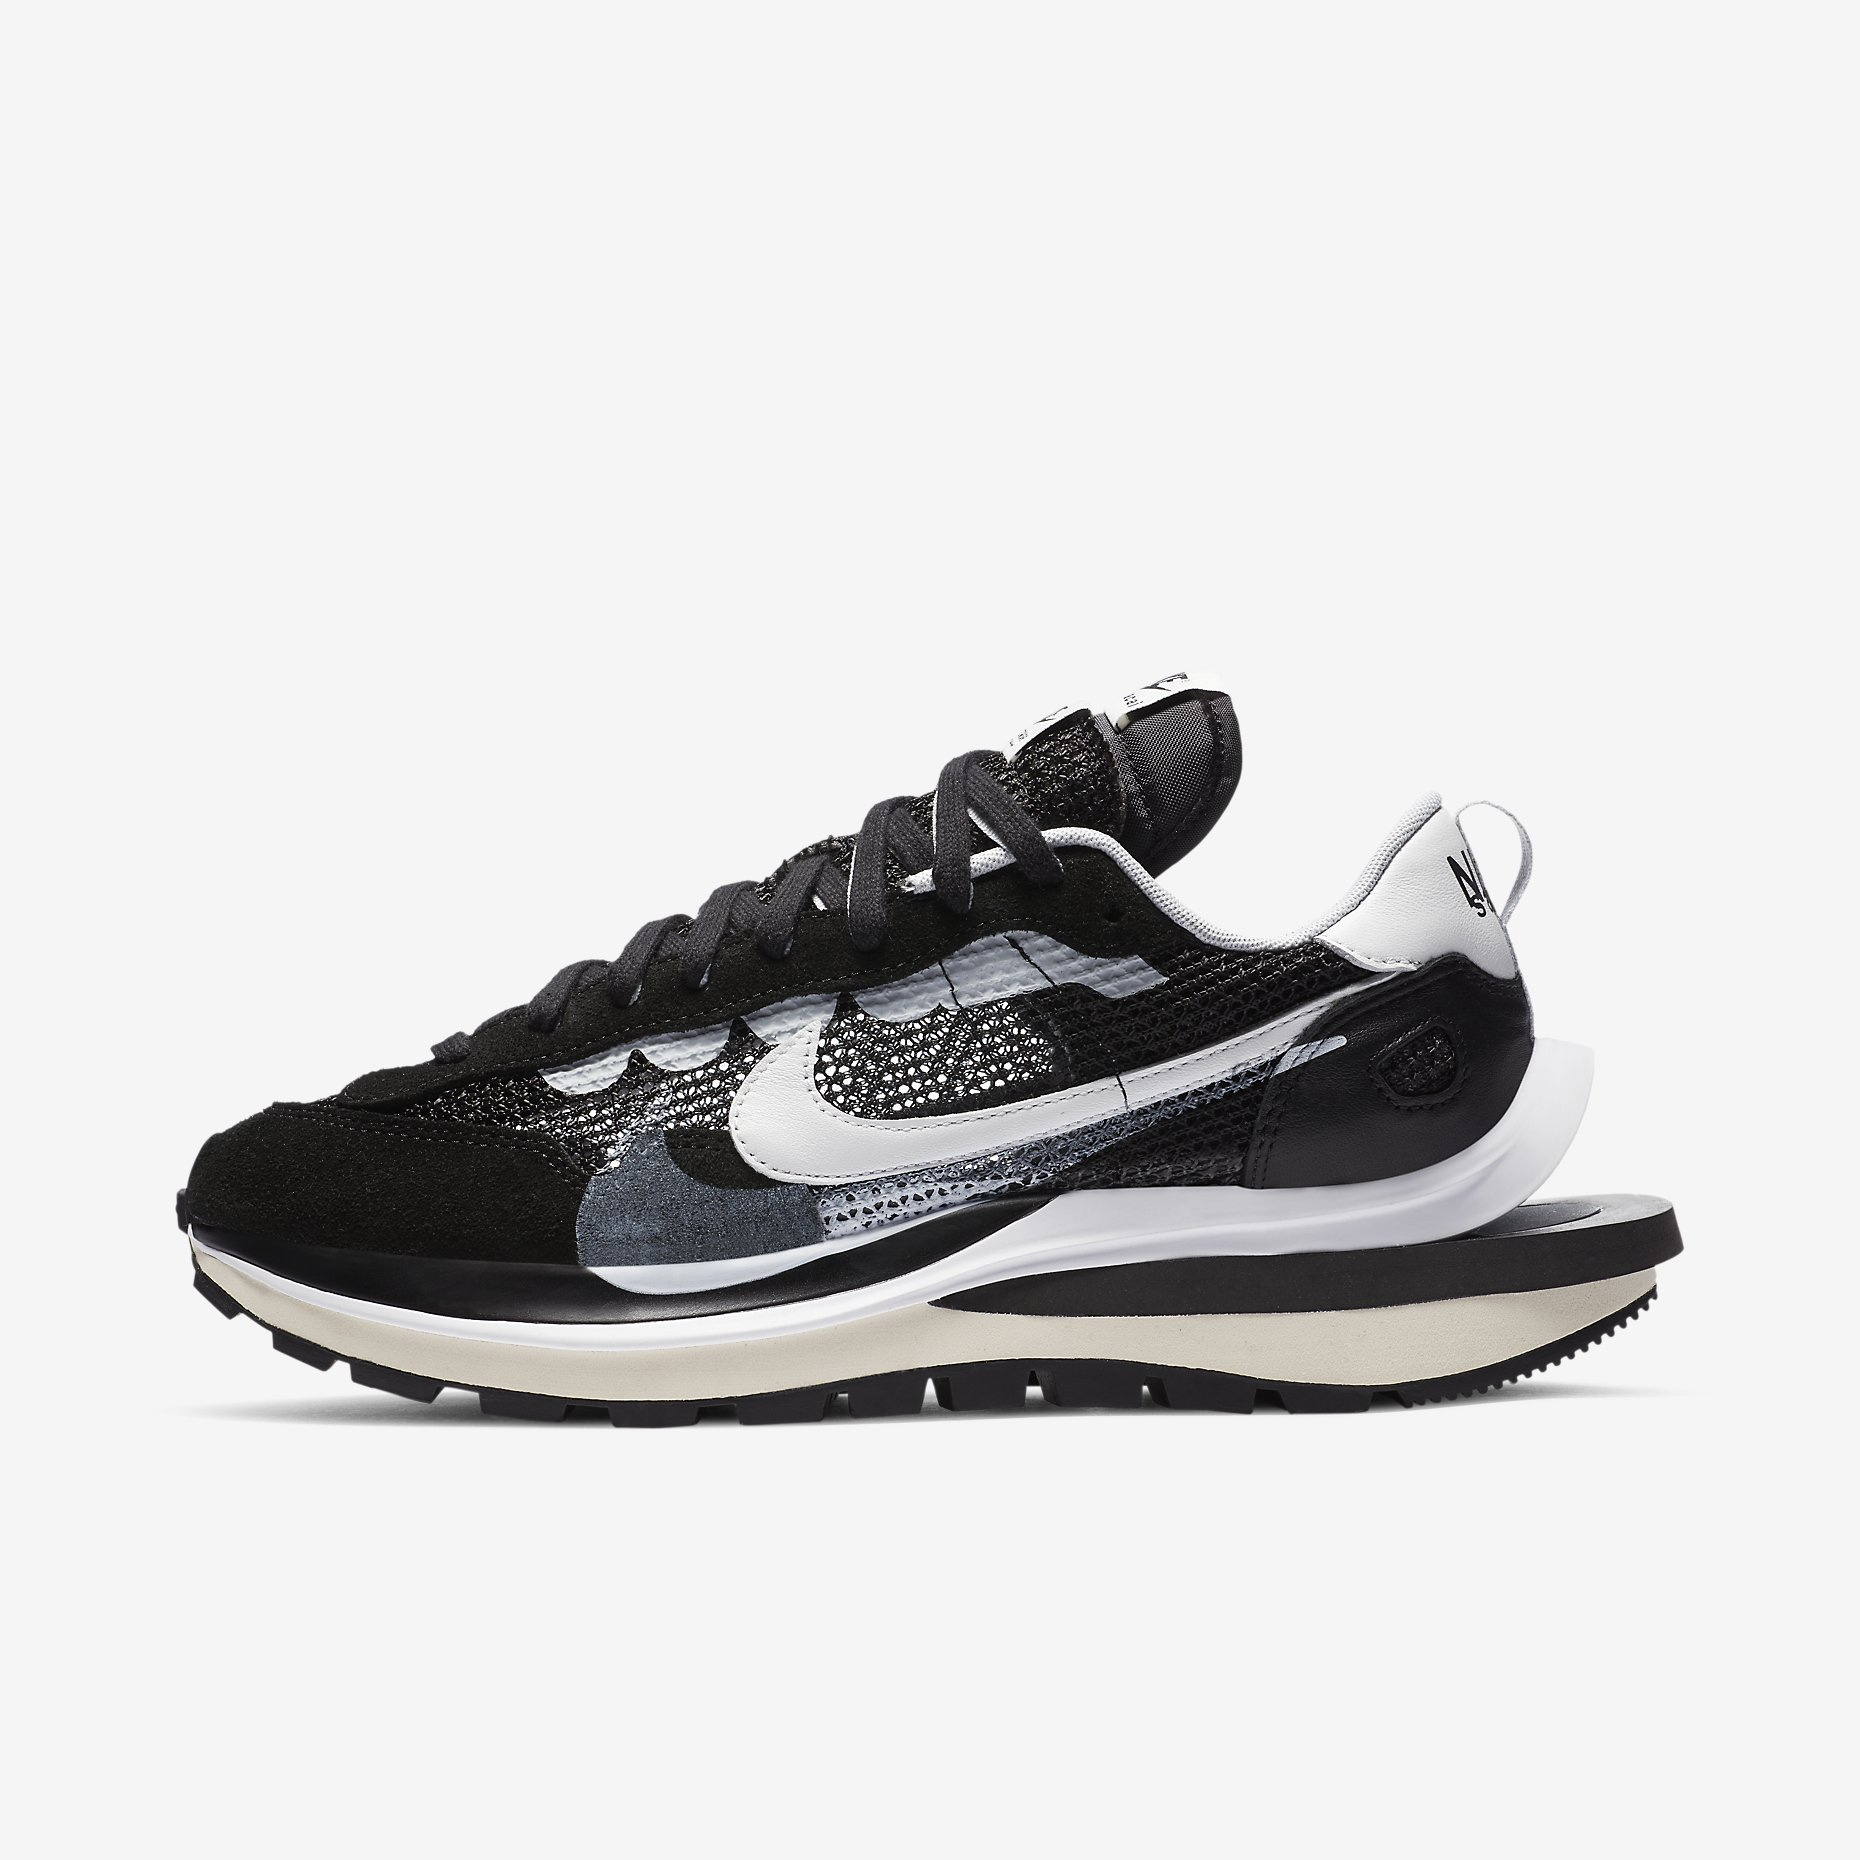 Nike x Sacai VaporWaffle 'Black/White'}